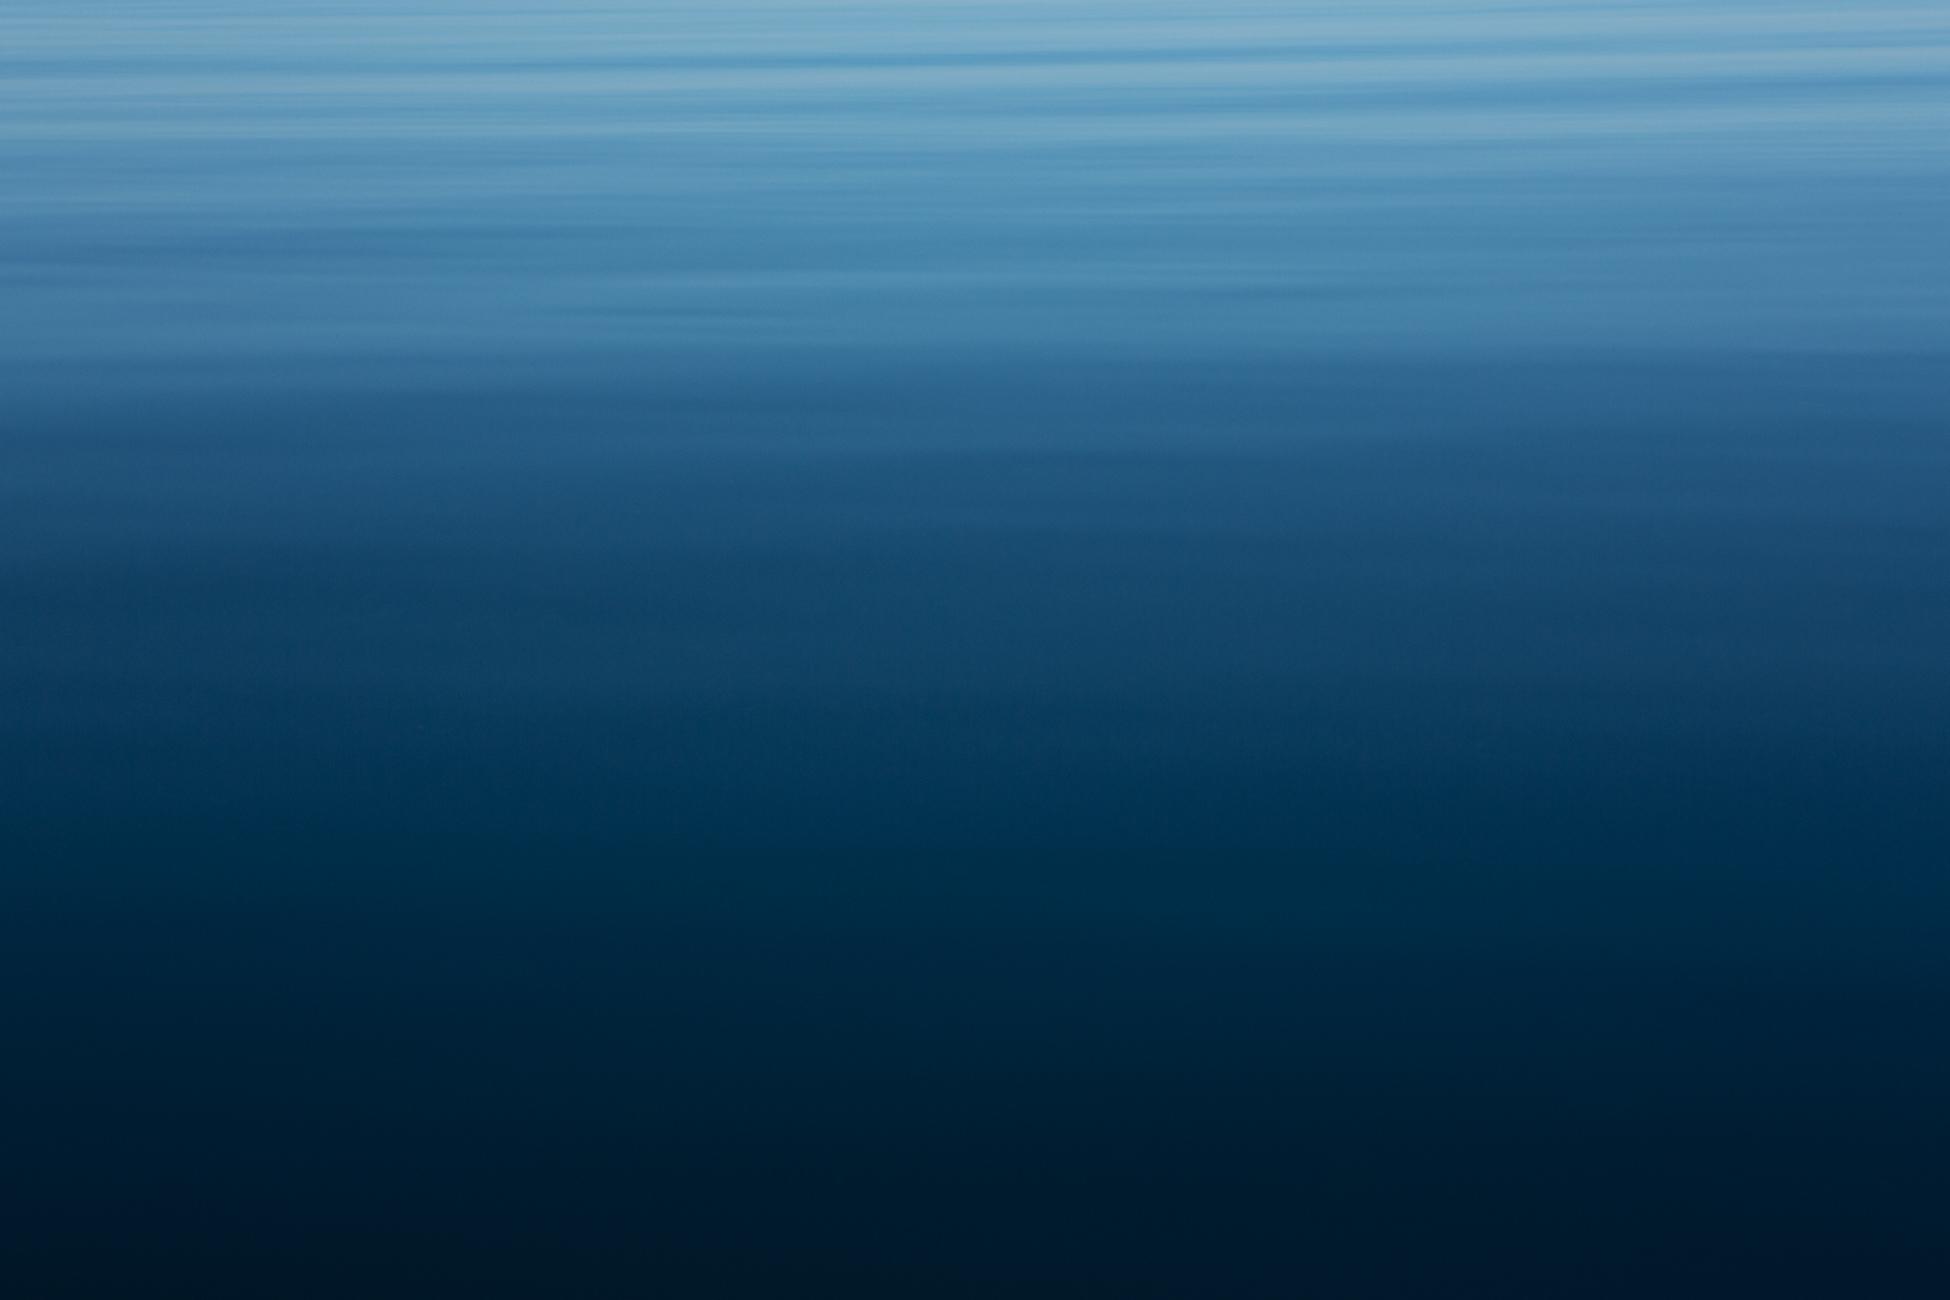 Water I, 2014 //  120 cm x 180 cm